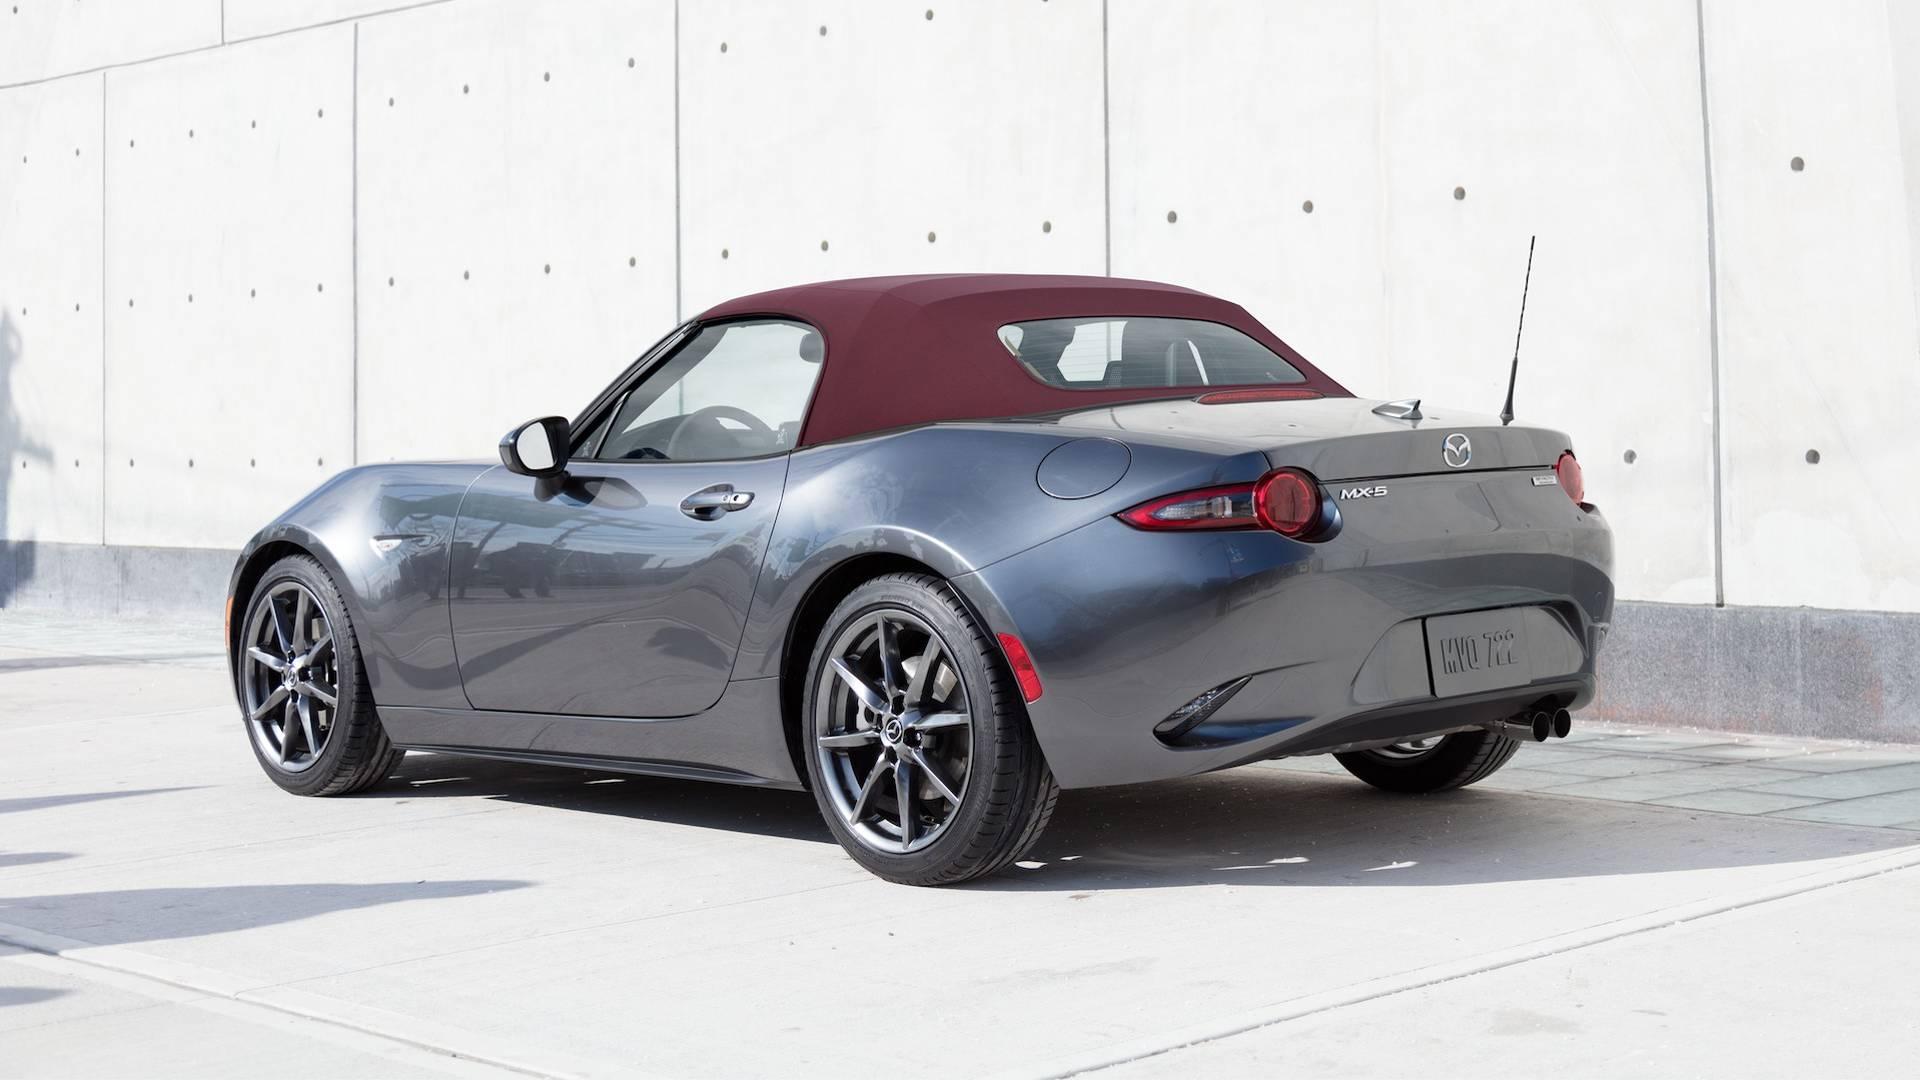 Kekurangan Mazda Mx 5 2018 Tangguh